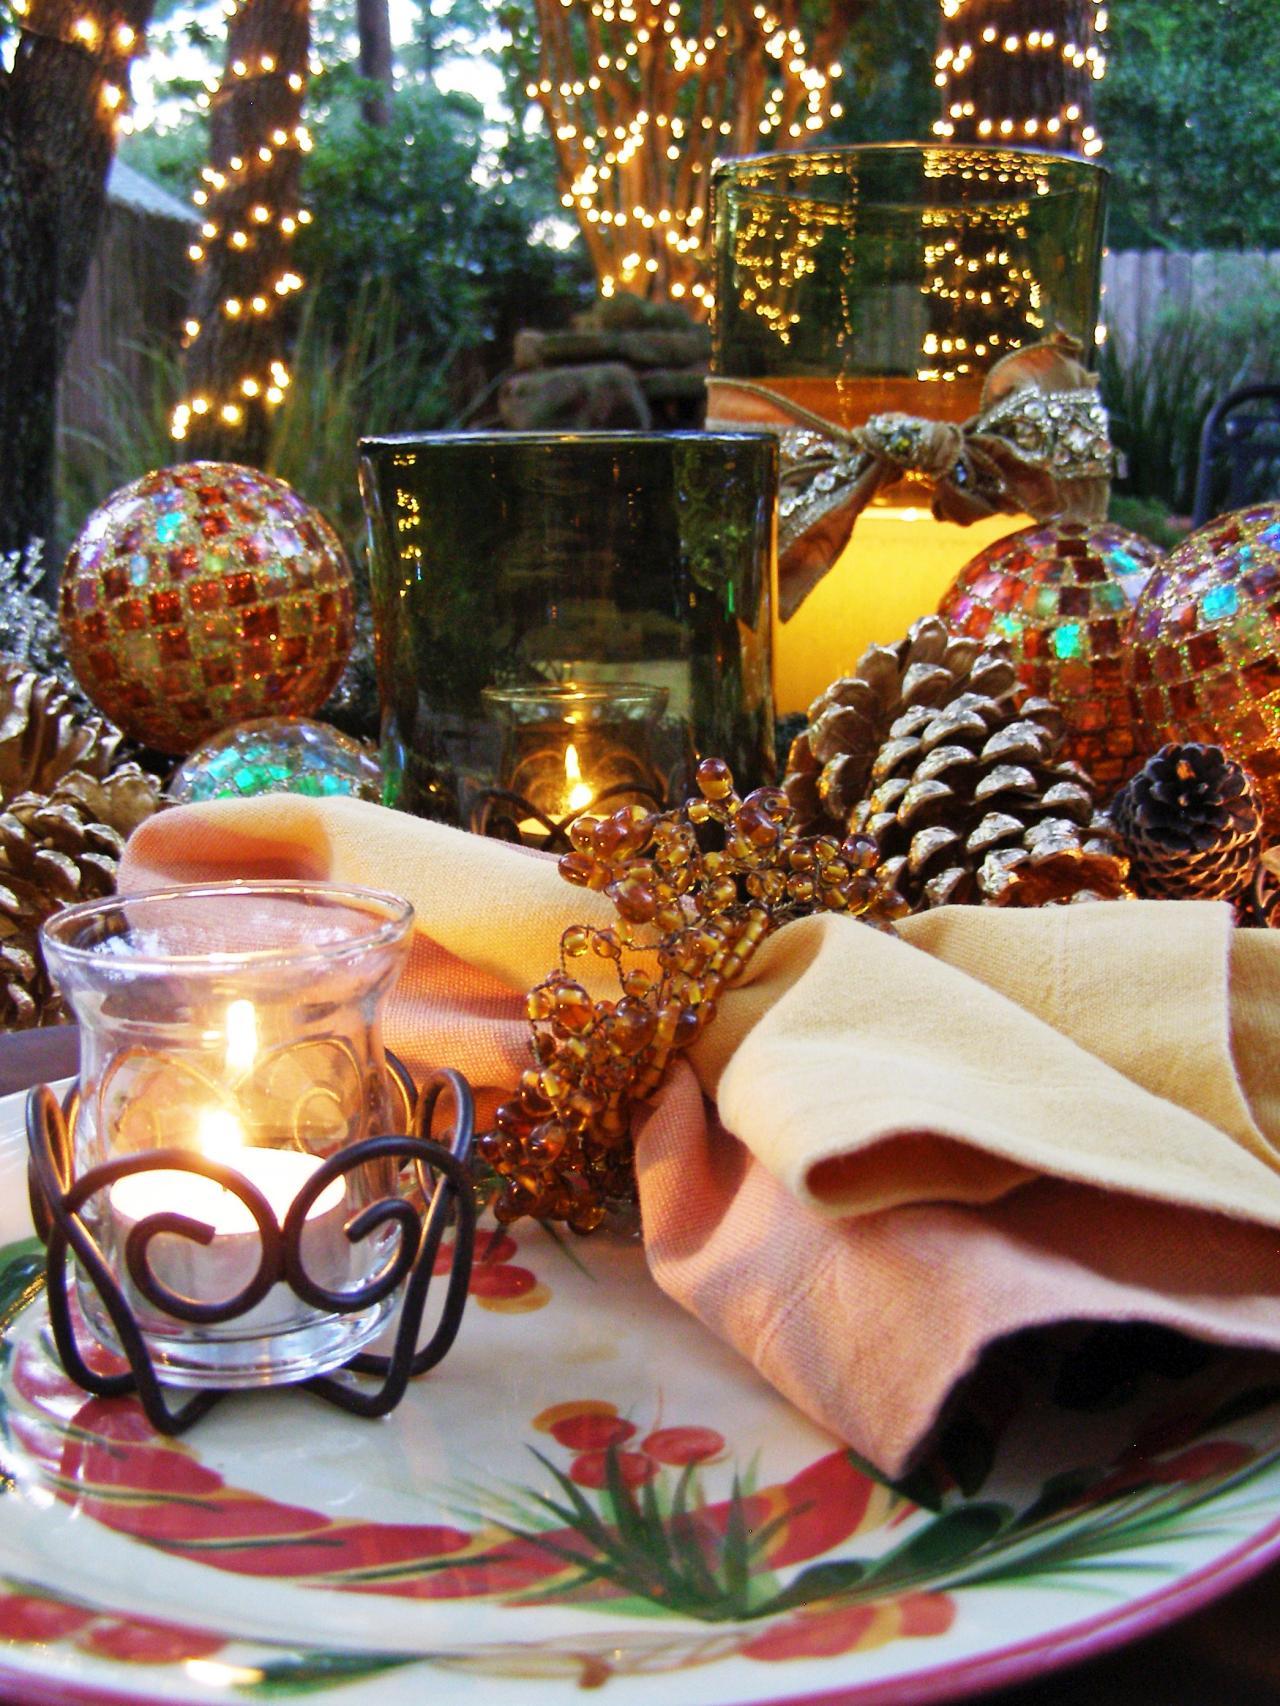 hgtv-christmas-home-decorating-ideas